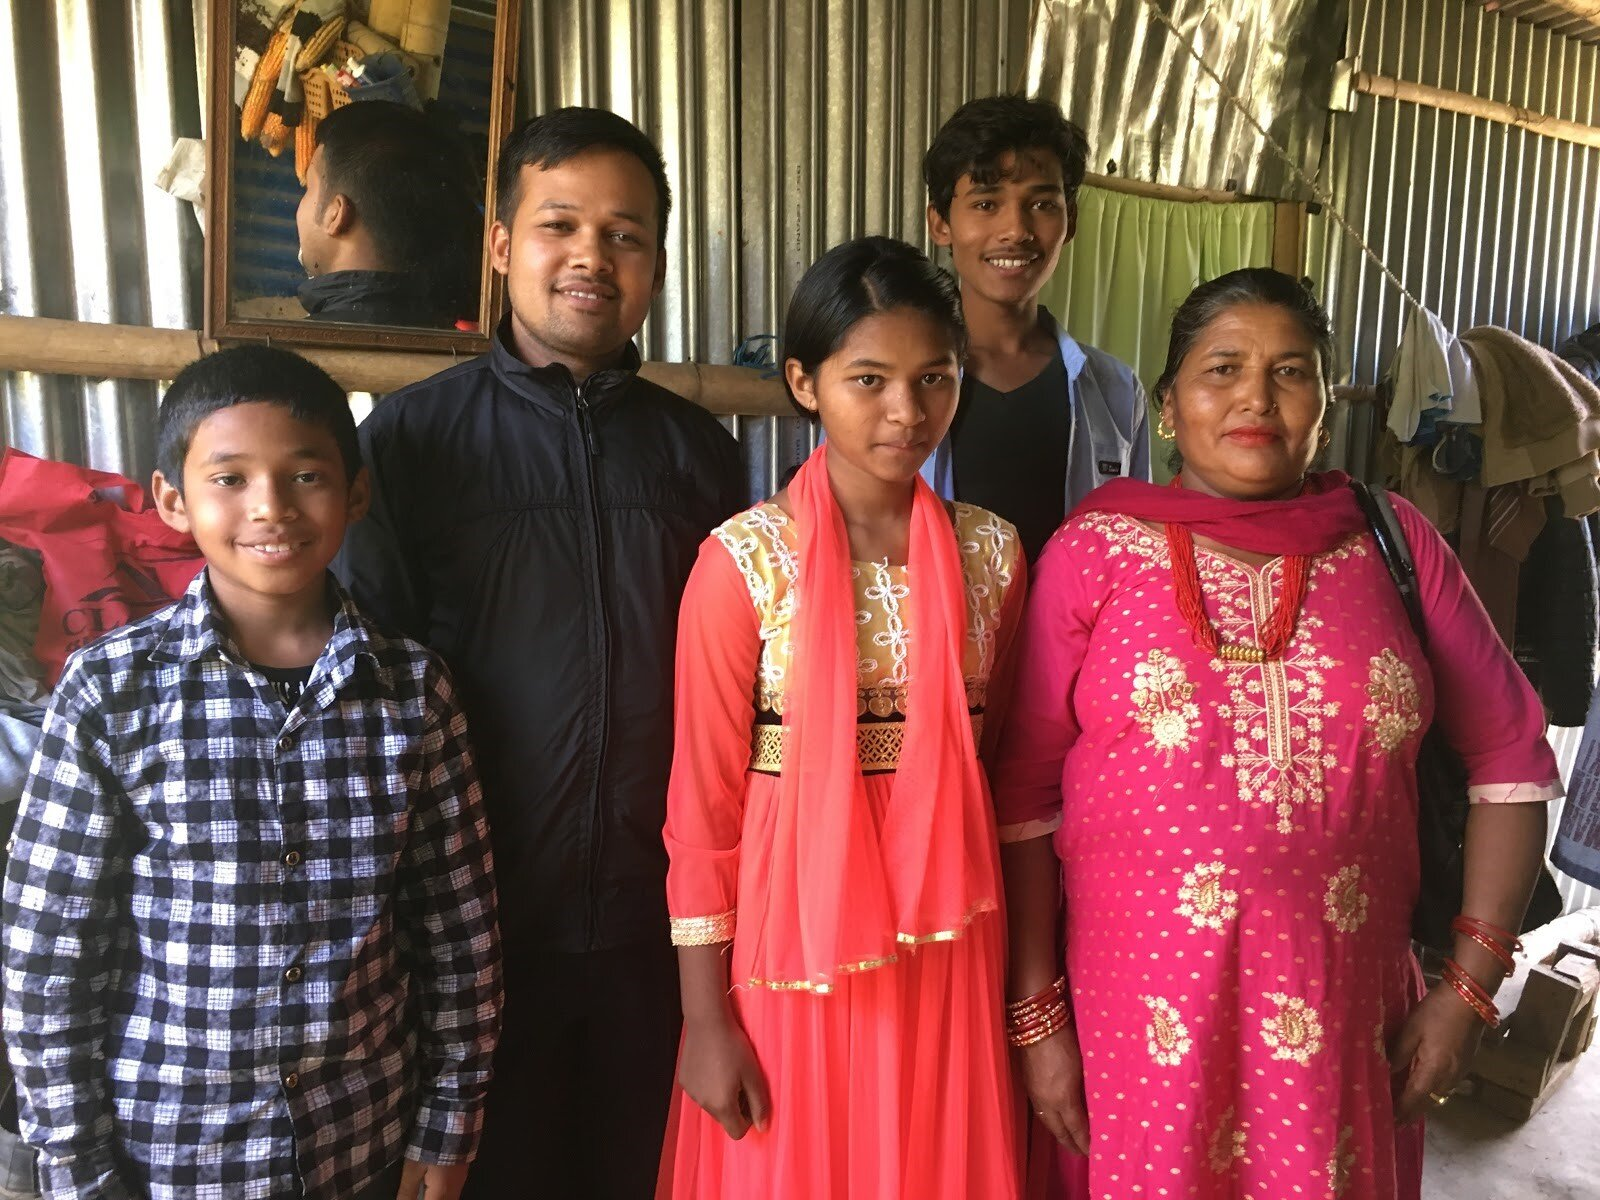 Kumar, Ram Kumar, Pawan, Purnima and their Grandma ready to go to the Mitrata graduation celebration.